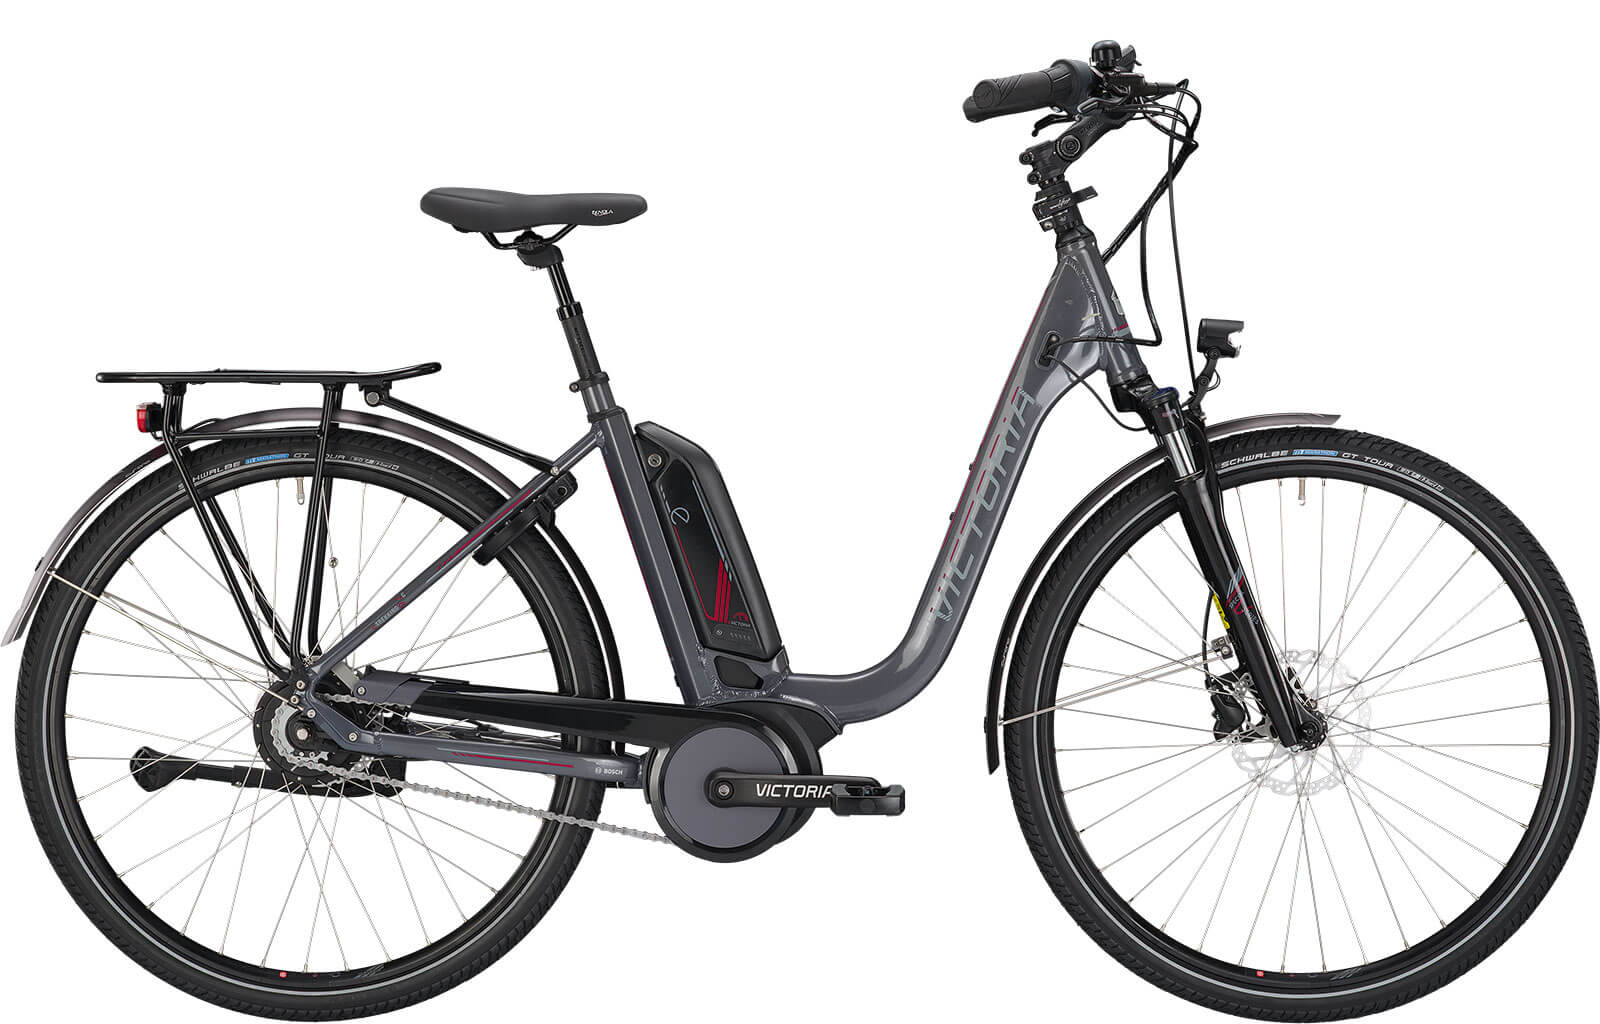 victoria e bike 7 8 trekking bosch active line plus nuvinci 380 modelj 19 delta bikes. Black Bedroom Furniture Sets. Home Design Ideas